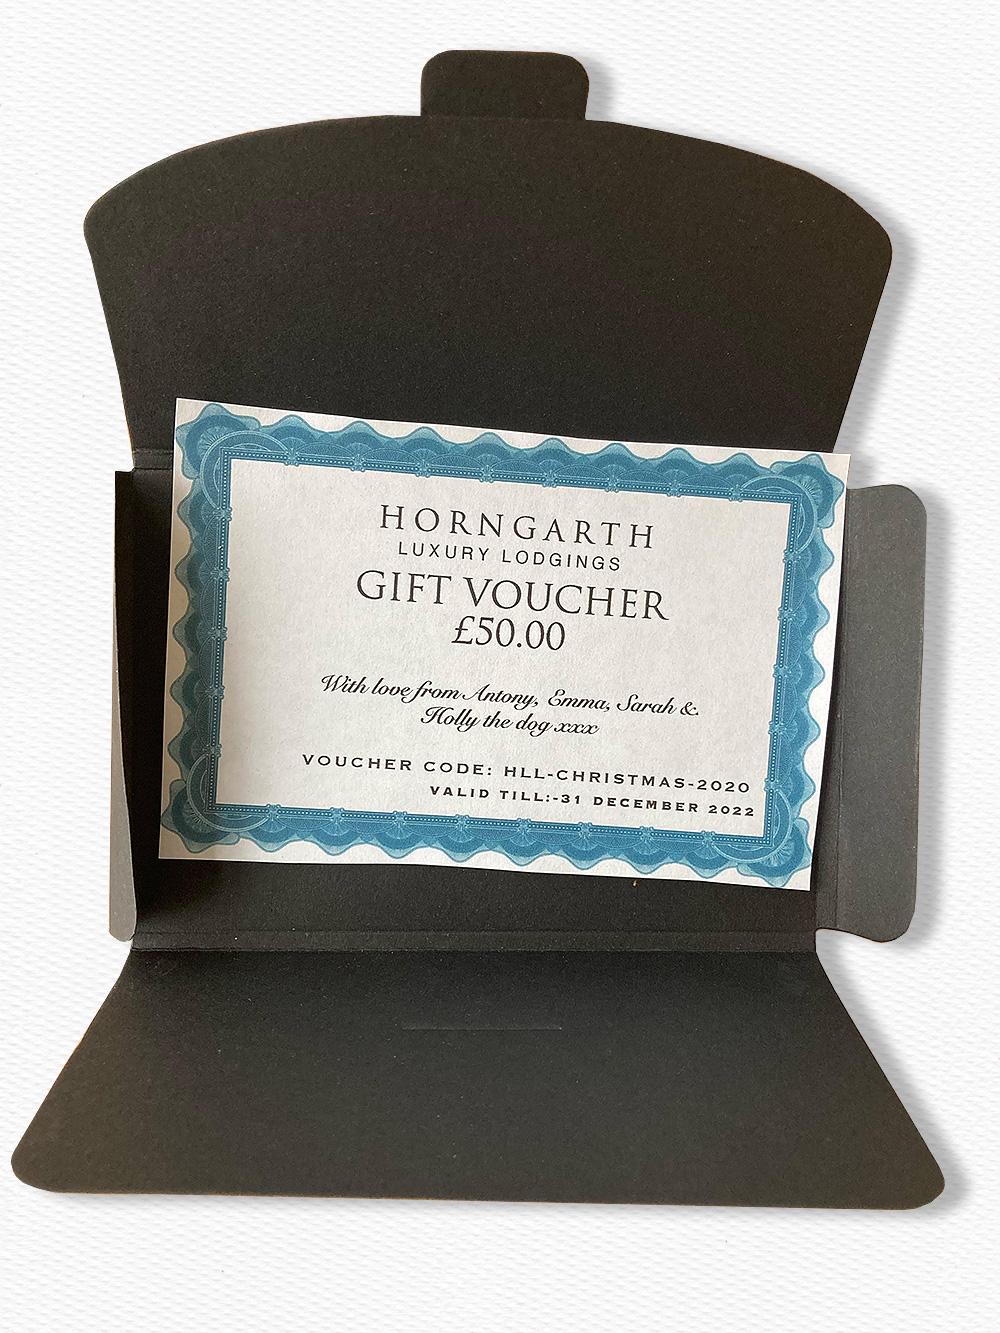 The Horngarth gift voucher